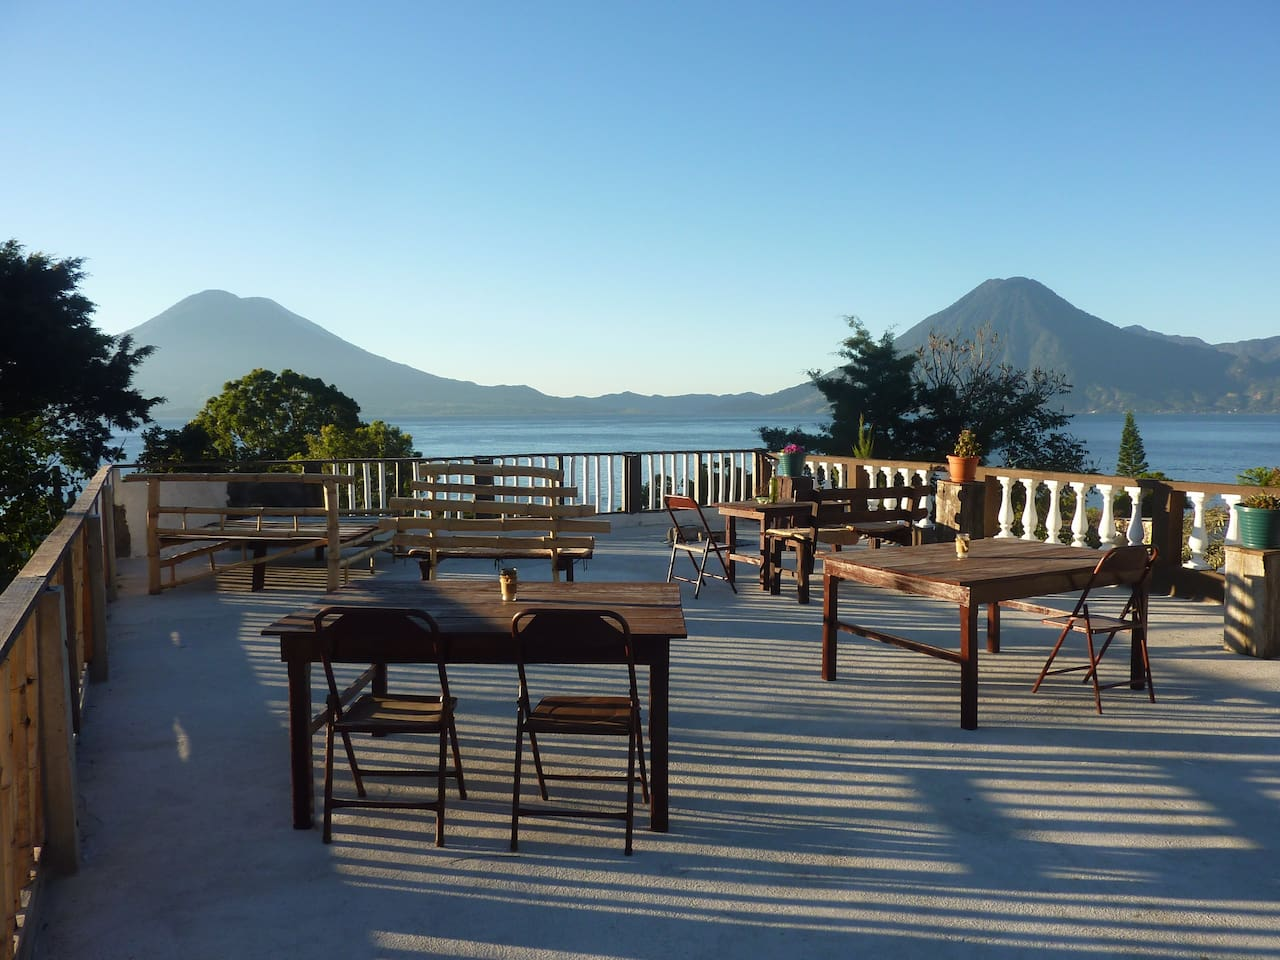 The Casa Kaktus terrace